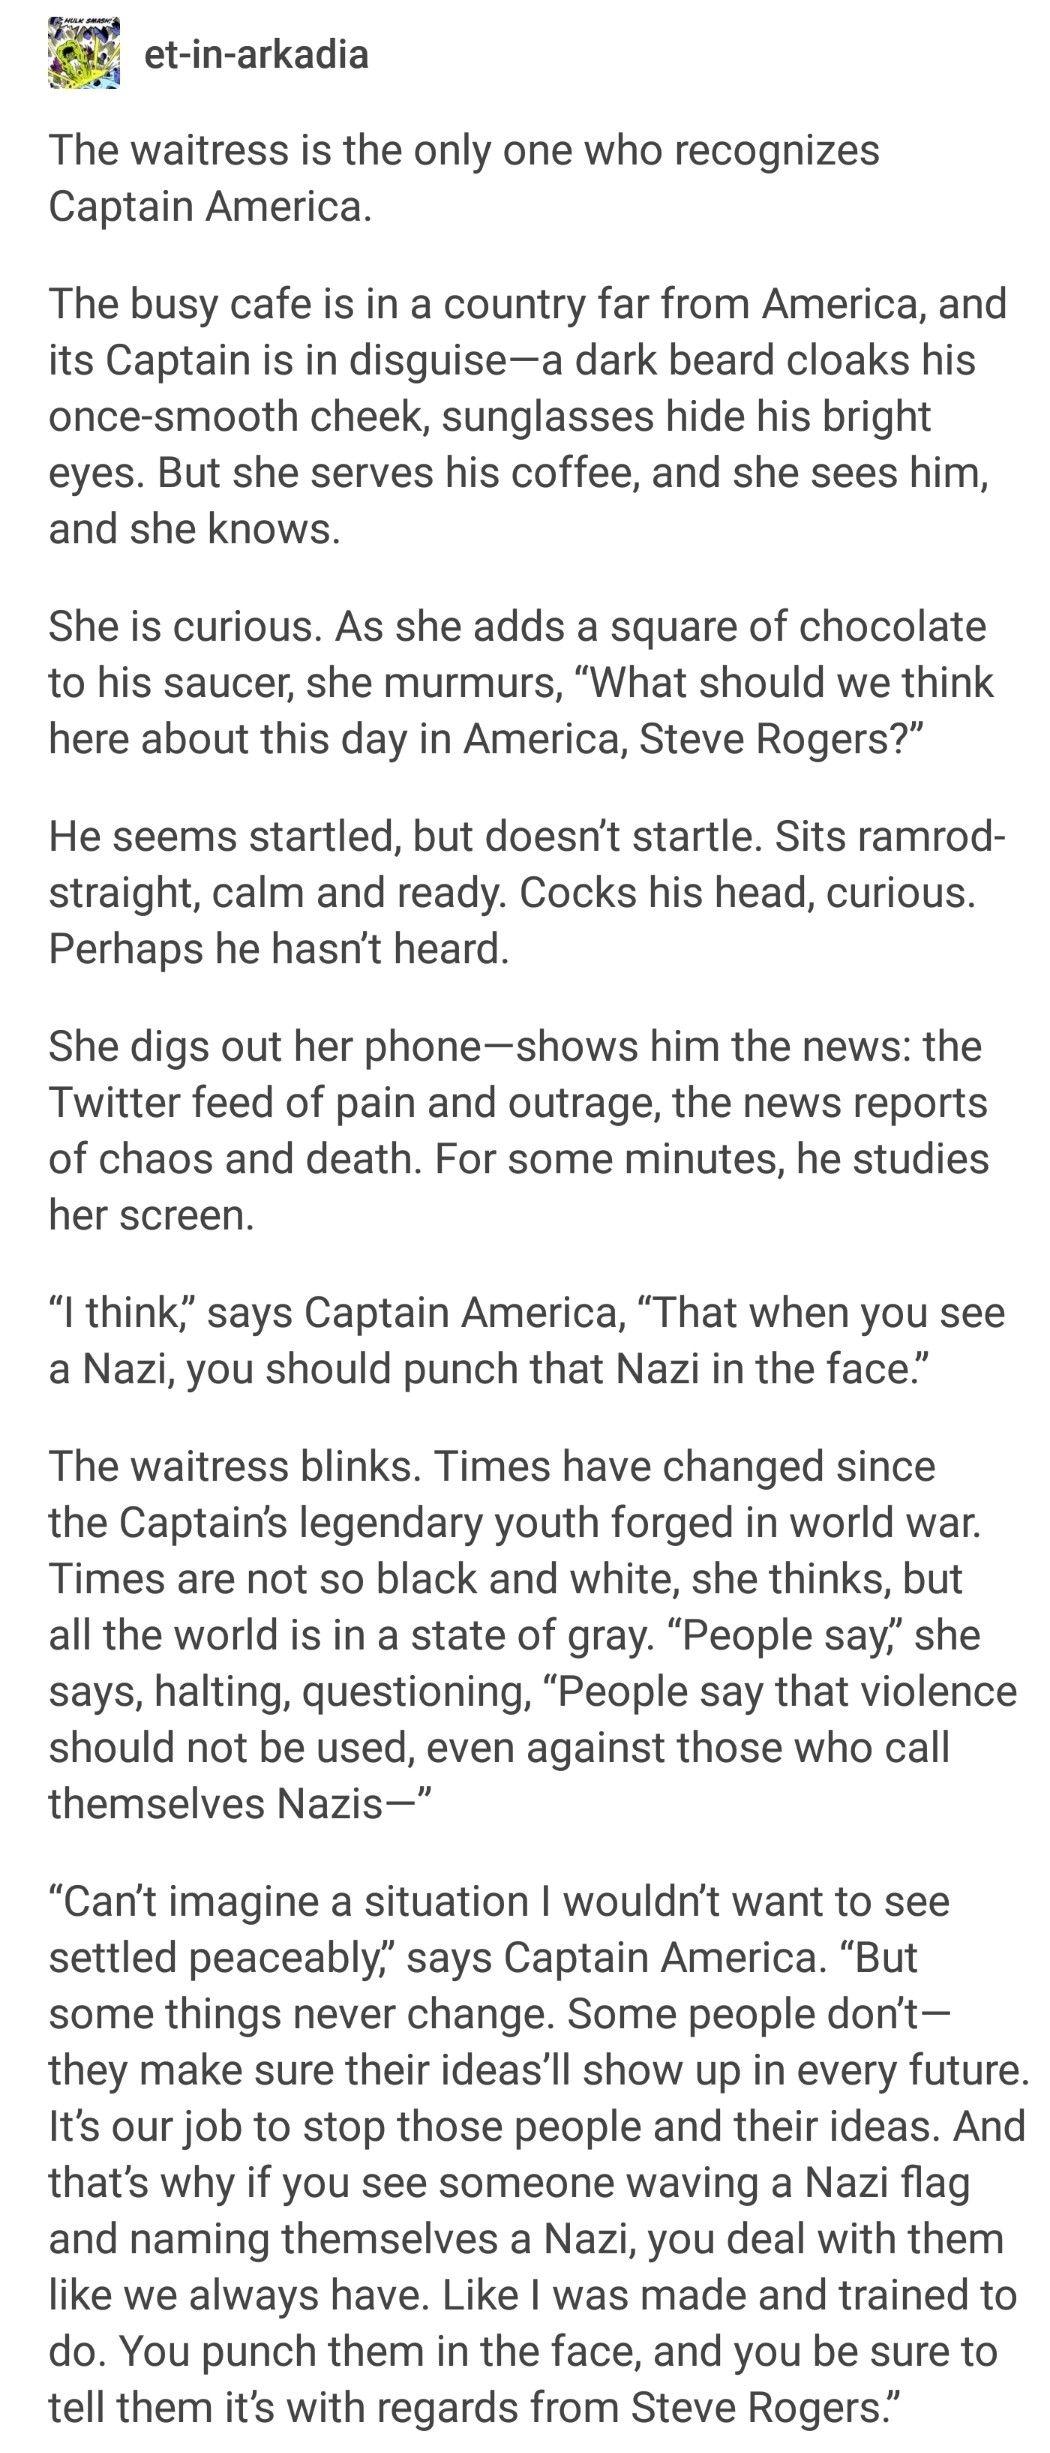 Steve Rogers is making Jack Kirby proud. #punchanaziintheface2k17